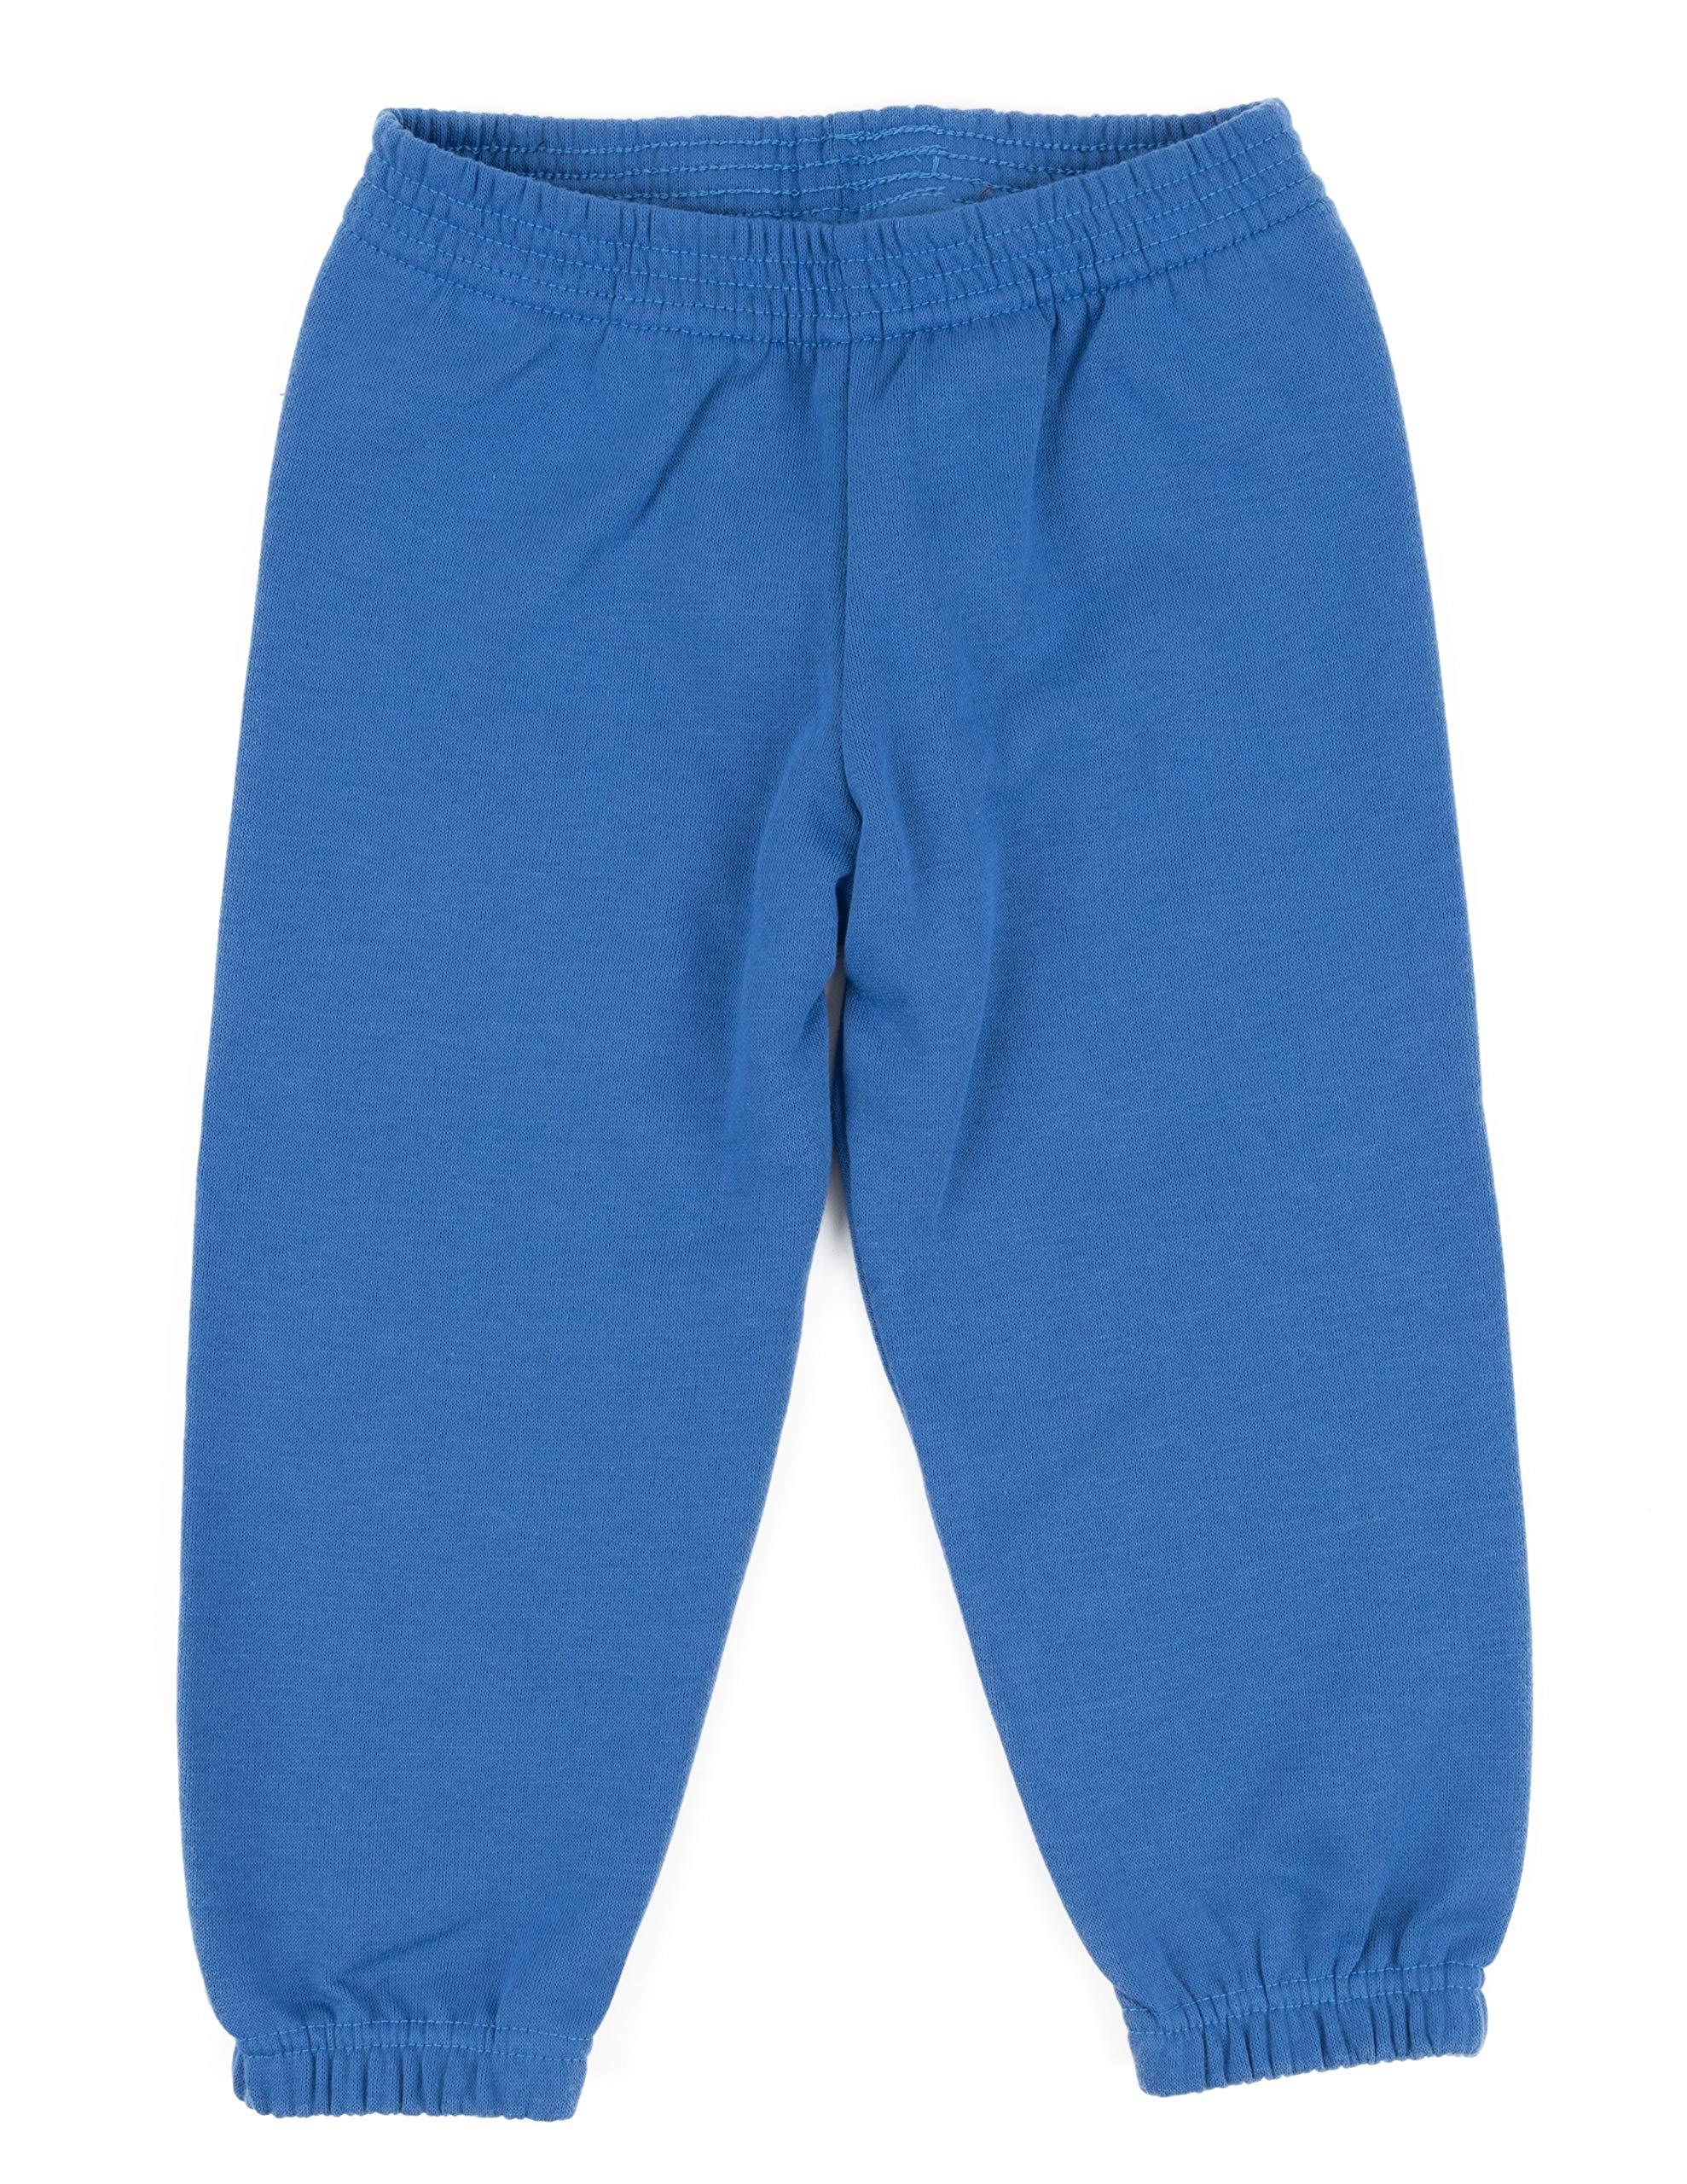 Leveret Boys Sweatpants Royal Blue 14 Years